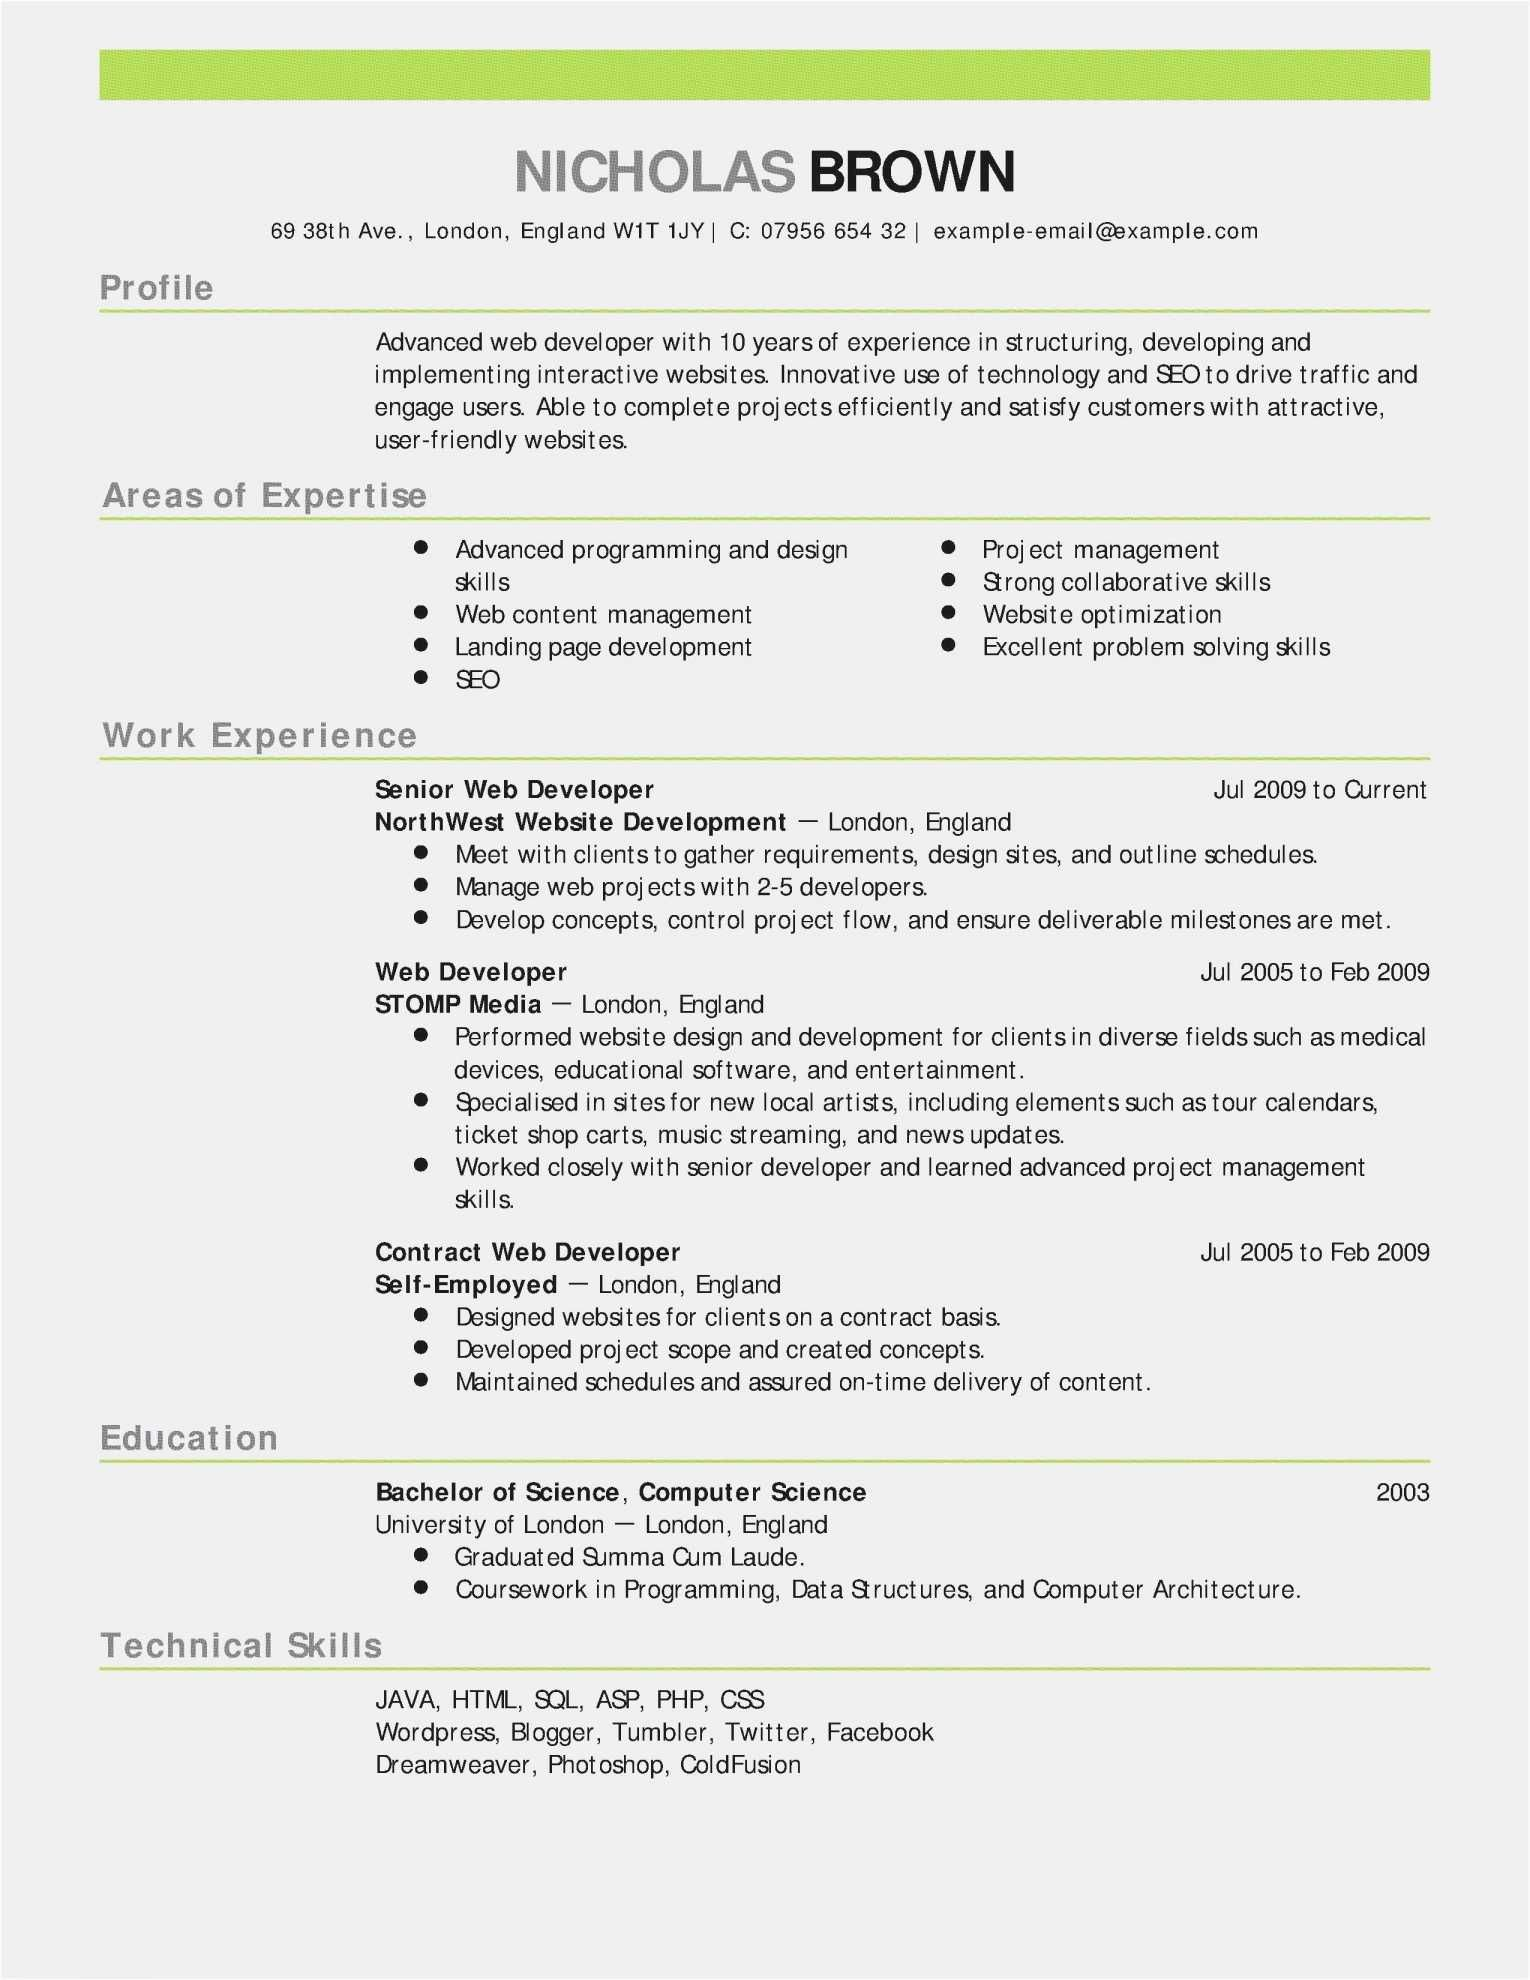 Hospital Invoice Sample Rn Resume Template Beautiful Rn Resume Templates New New Nurse Car Rental Invoice Format In Word Beautiful 2 Template Paralegal Drive